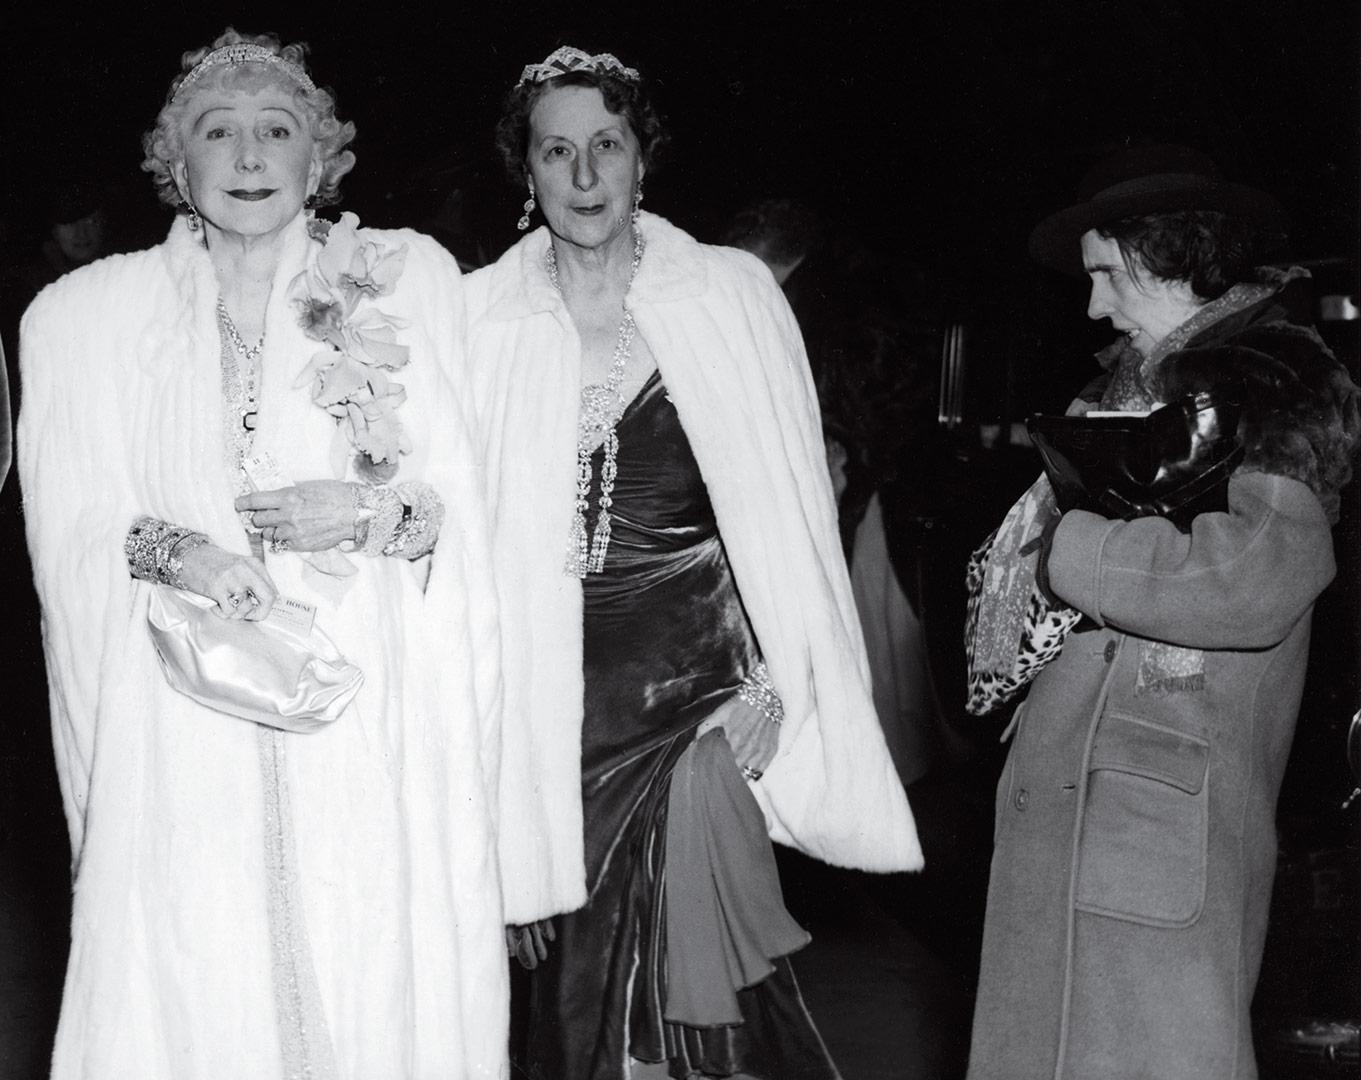 Fotó: Weegee: A kritikus, 1943. december 6. © Time.com